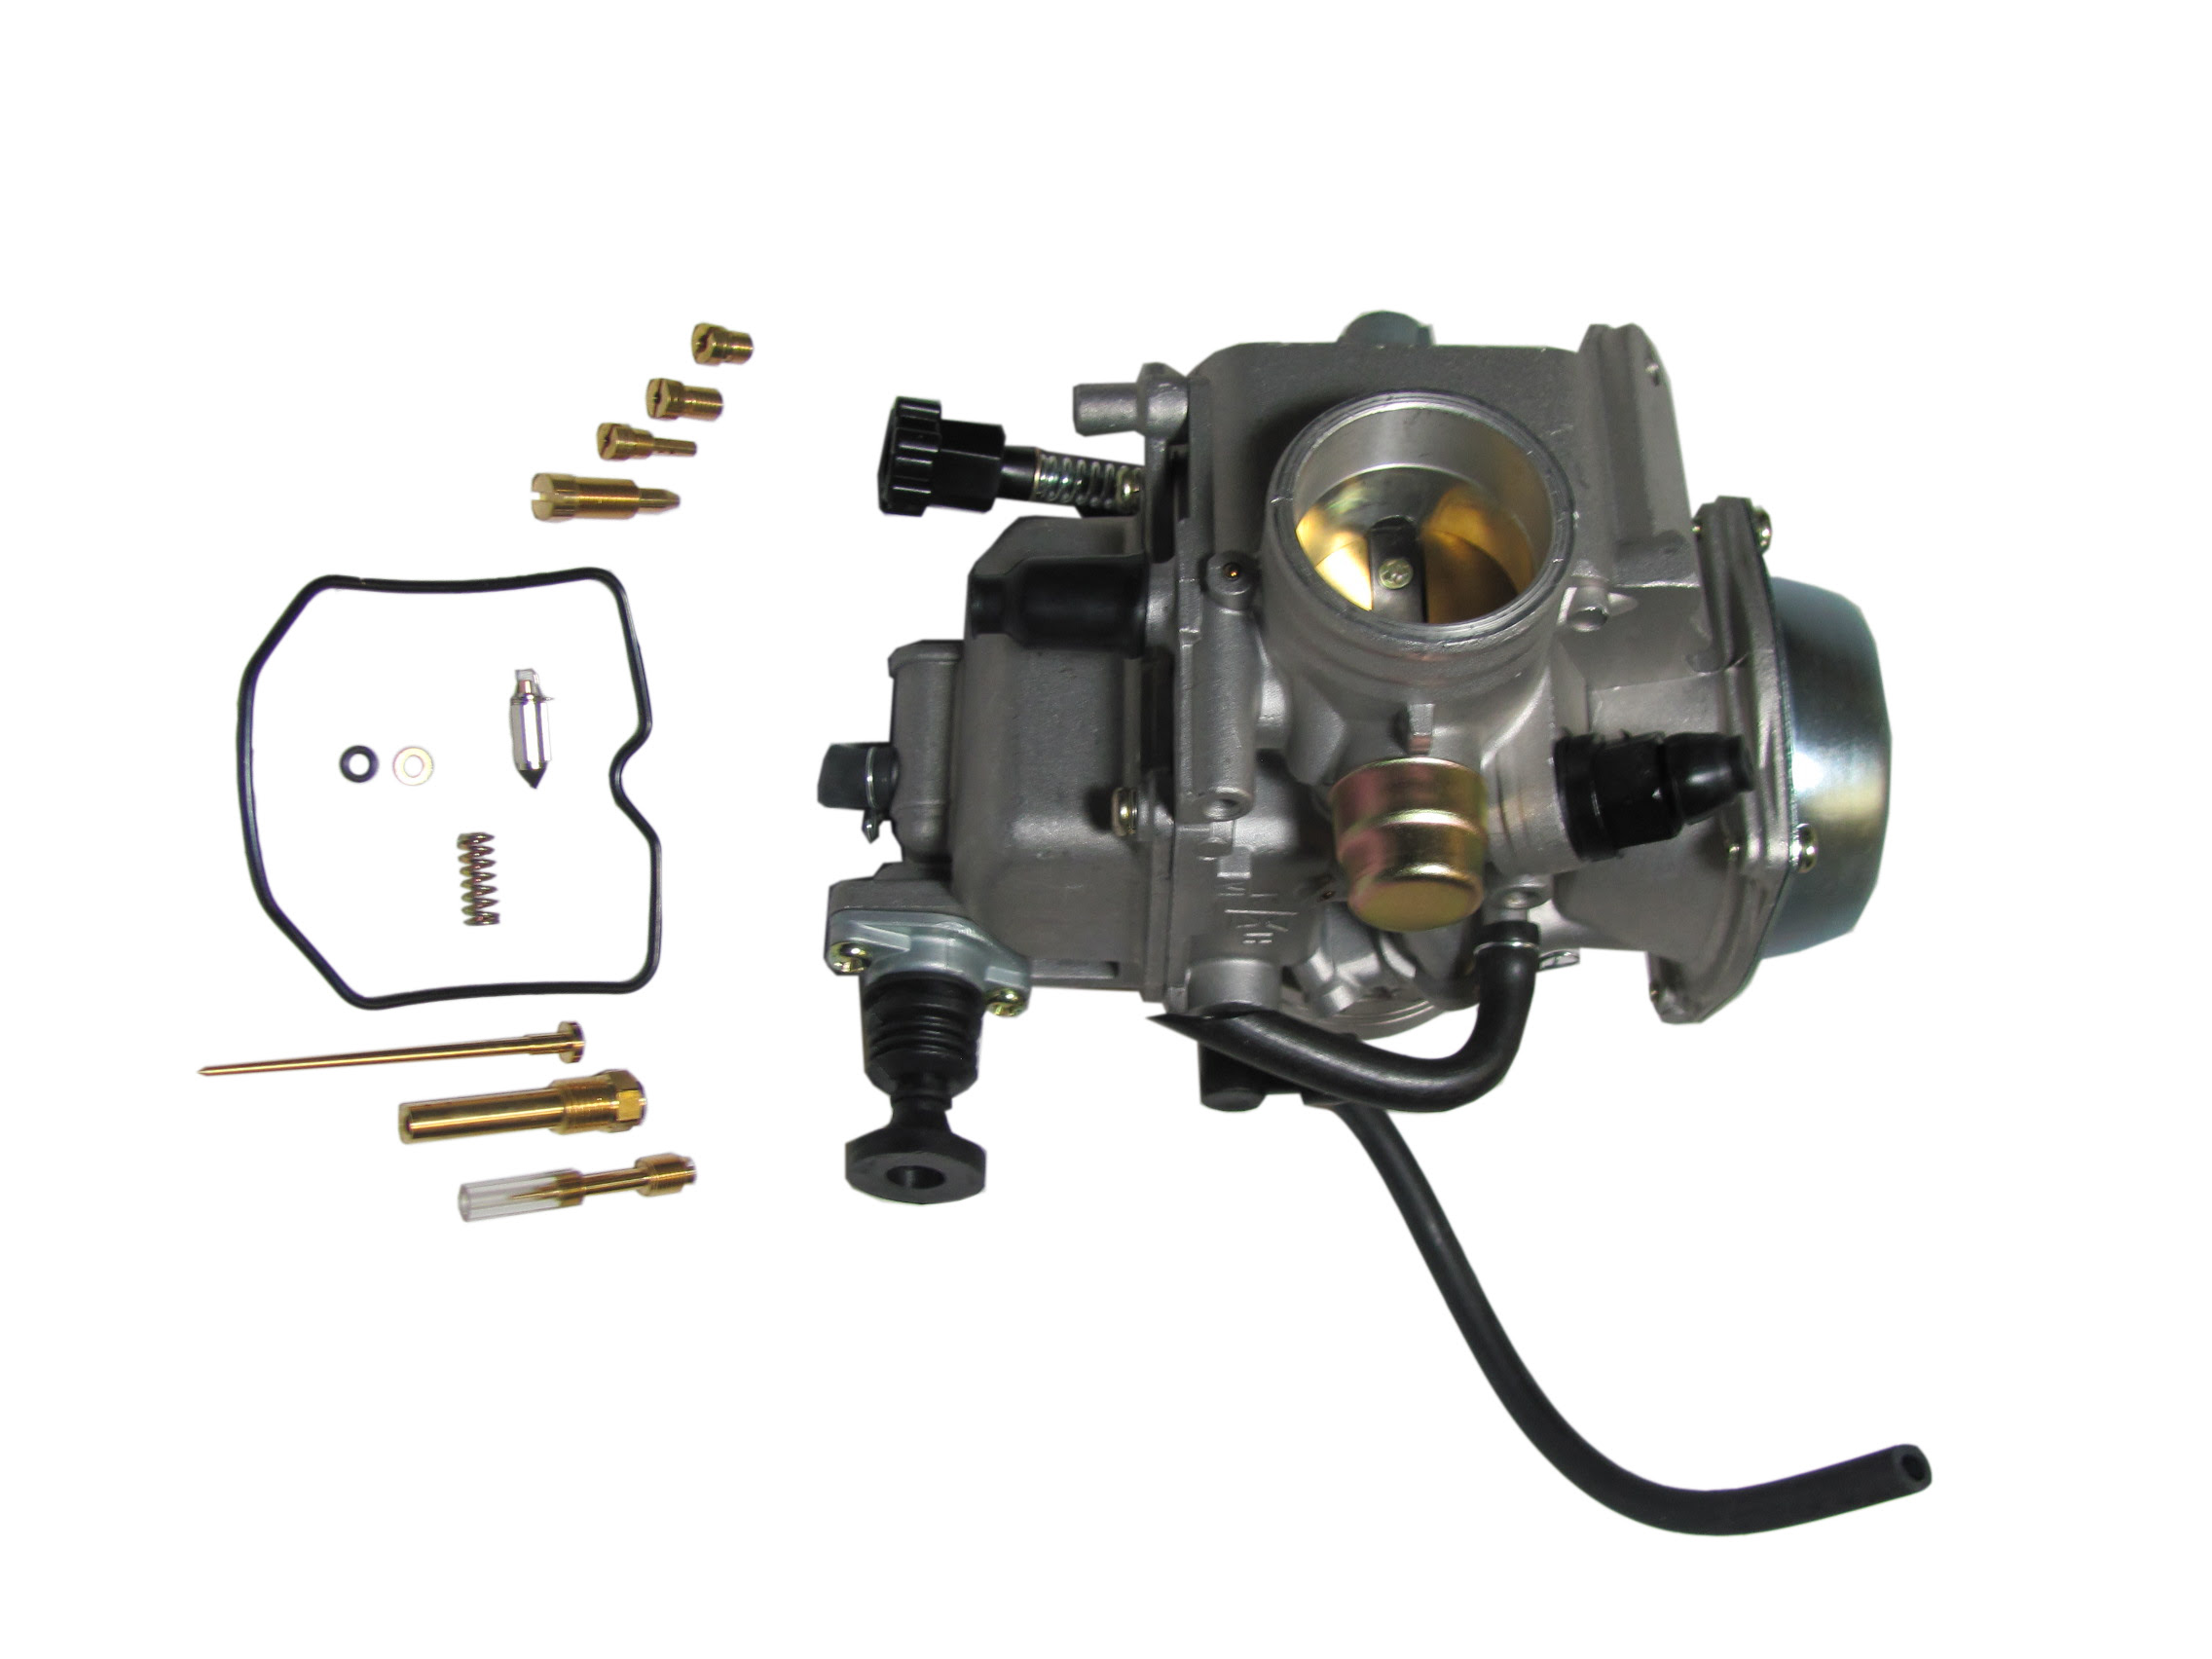 Wiring Diagram Database: Honda Atc 200 Carb Diagram